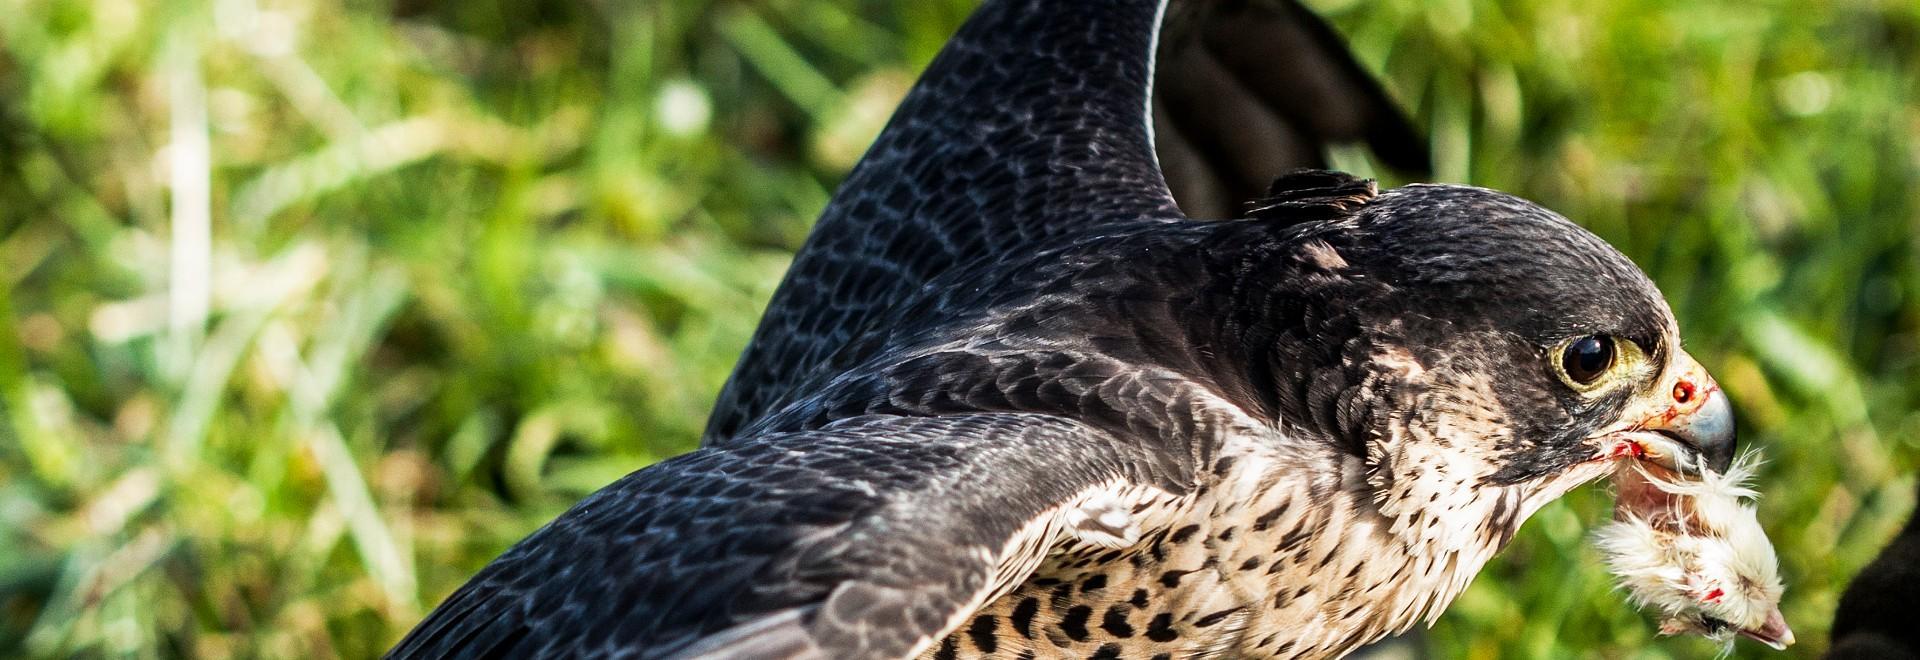 Uccellatori per tradizione